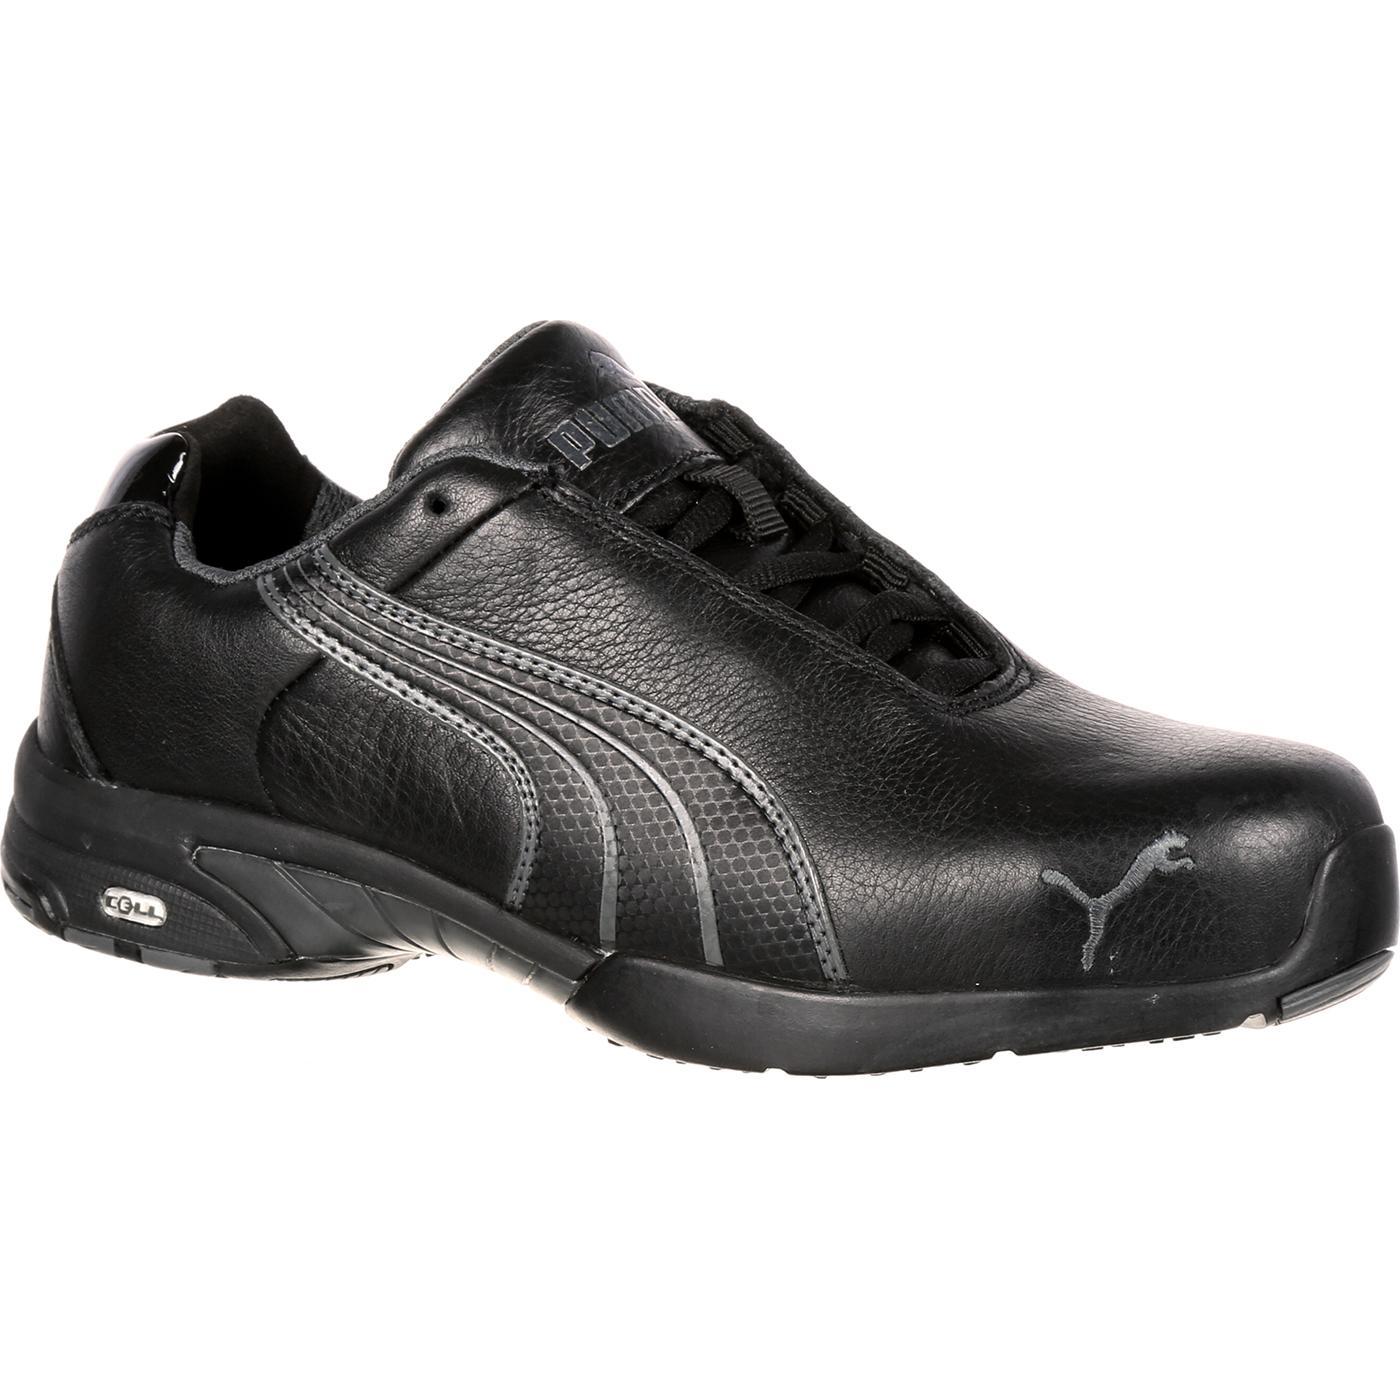 Puma Womenu0026#39;s ST Athletic Work Shoe #P642855